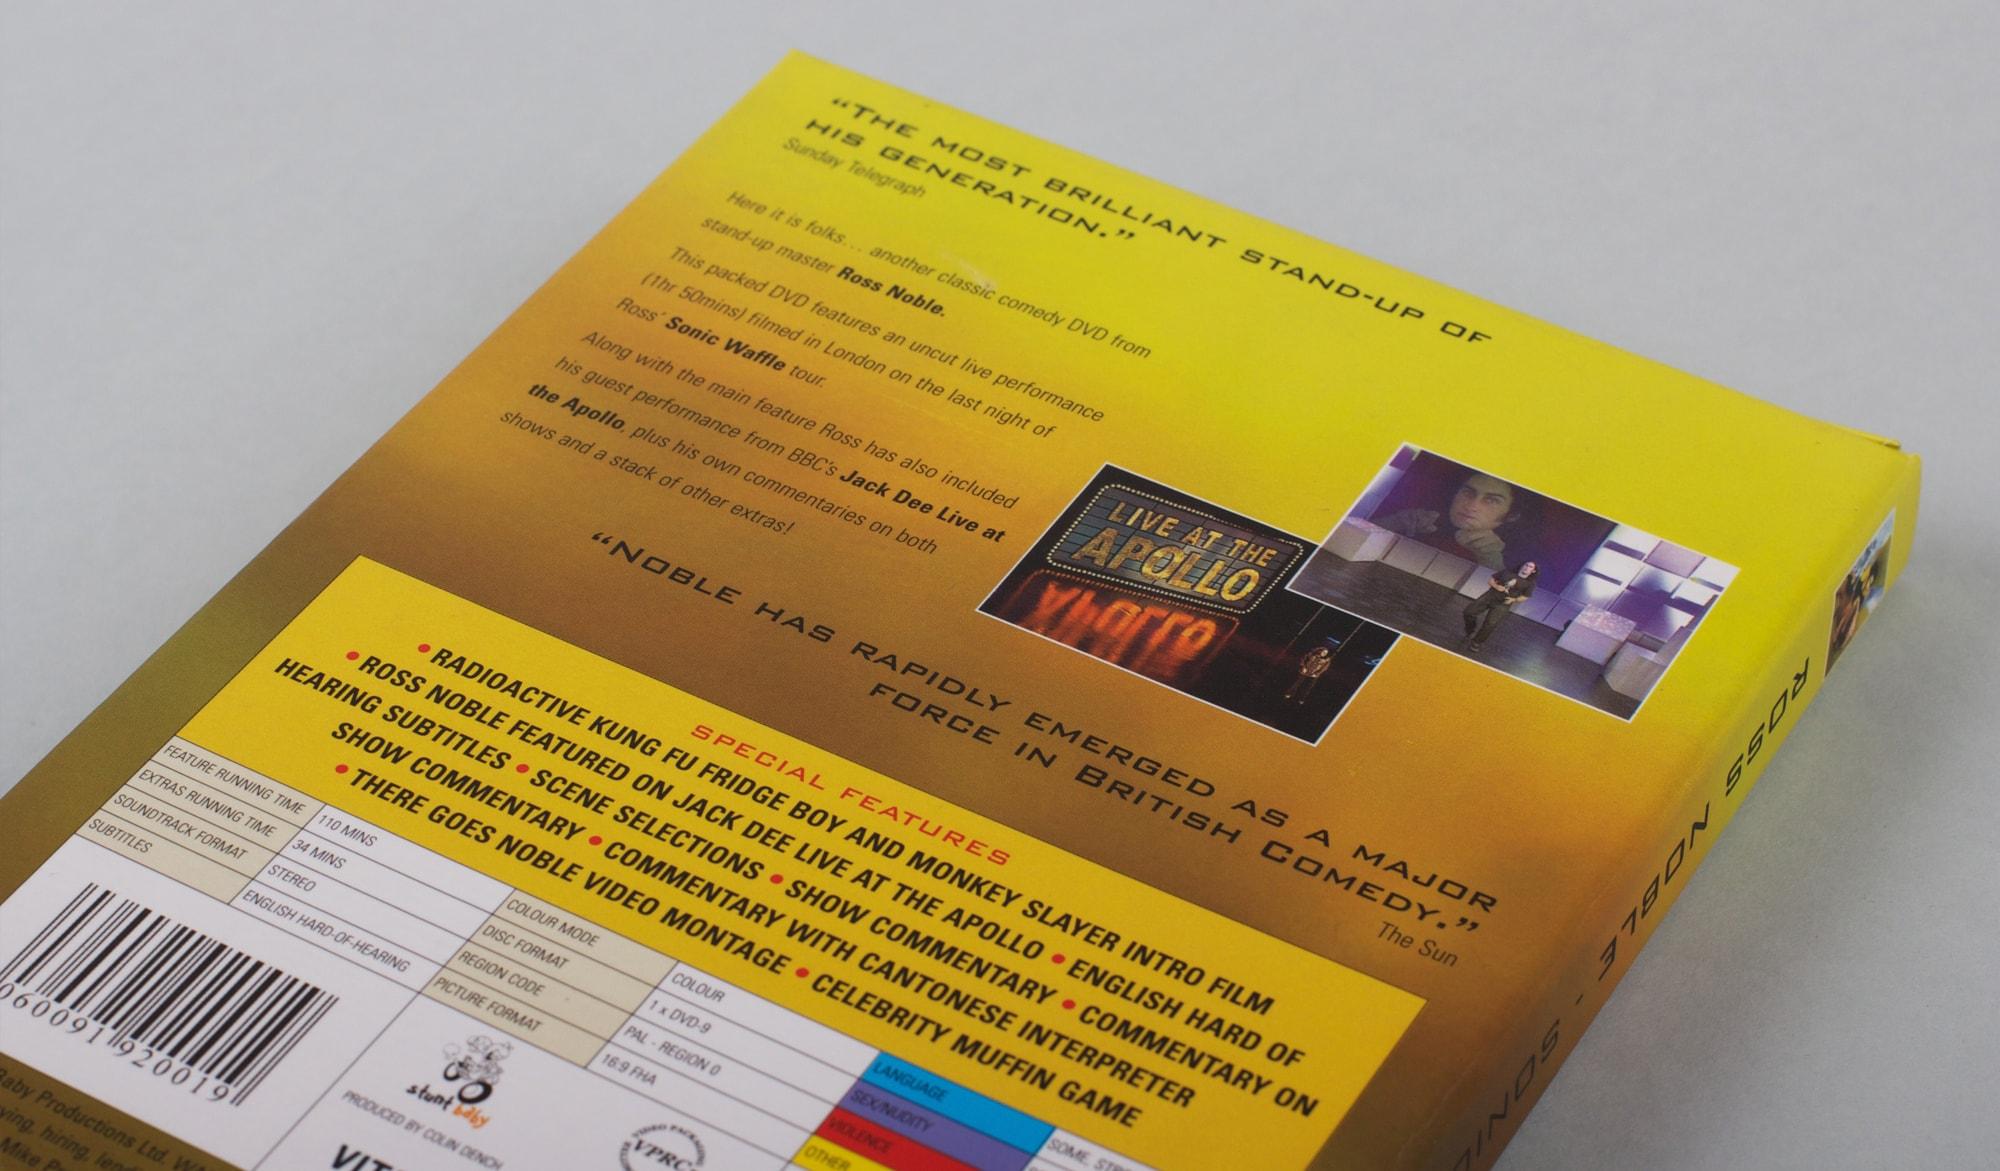 Ross Noble - Sonic Waffle DVD - back